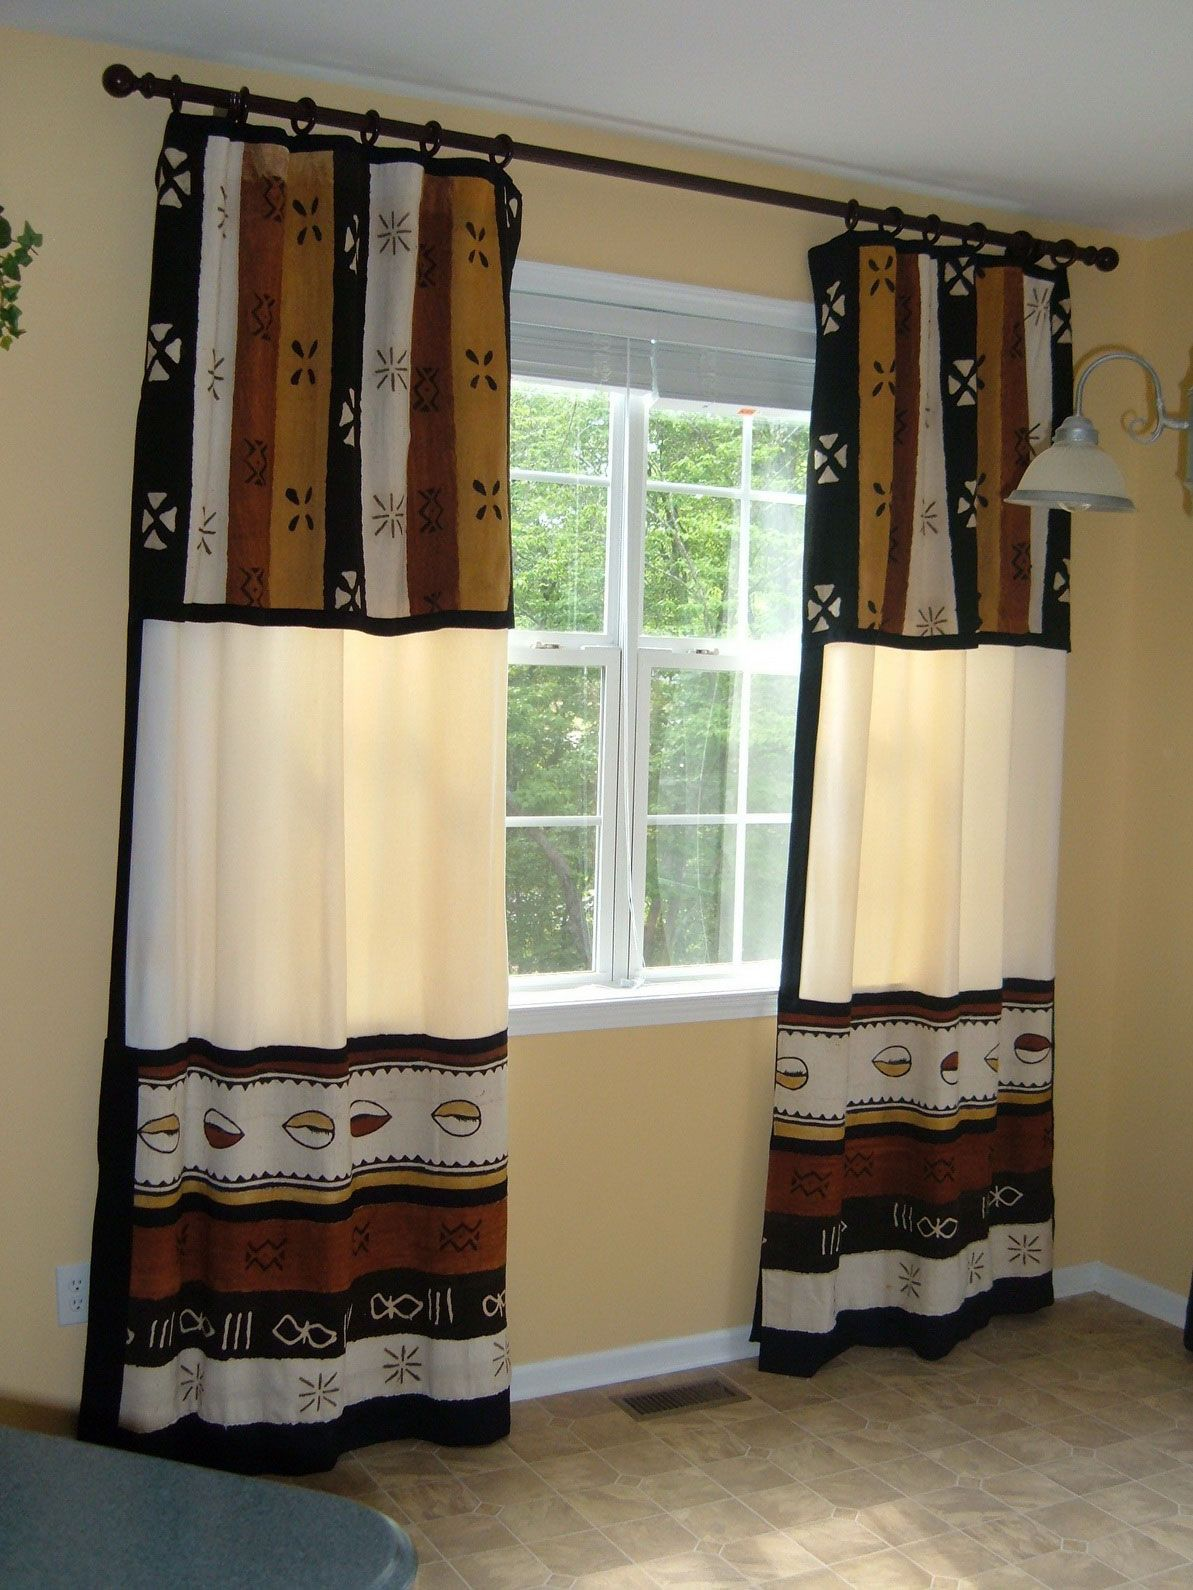 17 best images about curtains window treatments ideas on pinterest plantation shutter uxui designer and chairs - Window Treatments Ideas